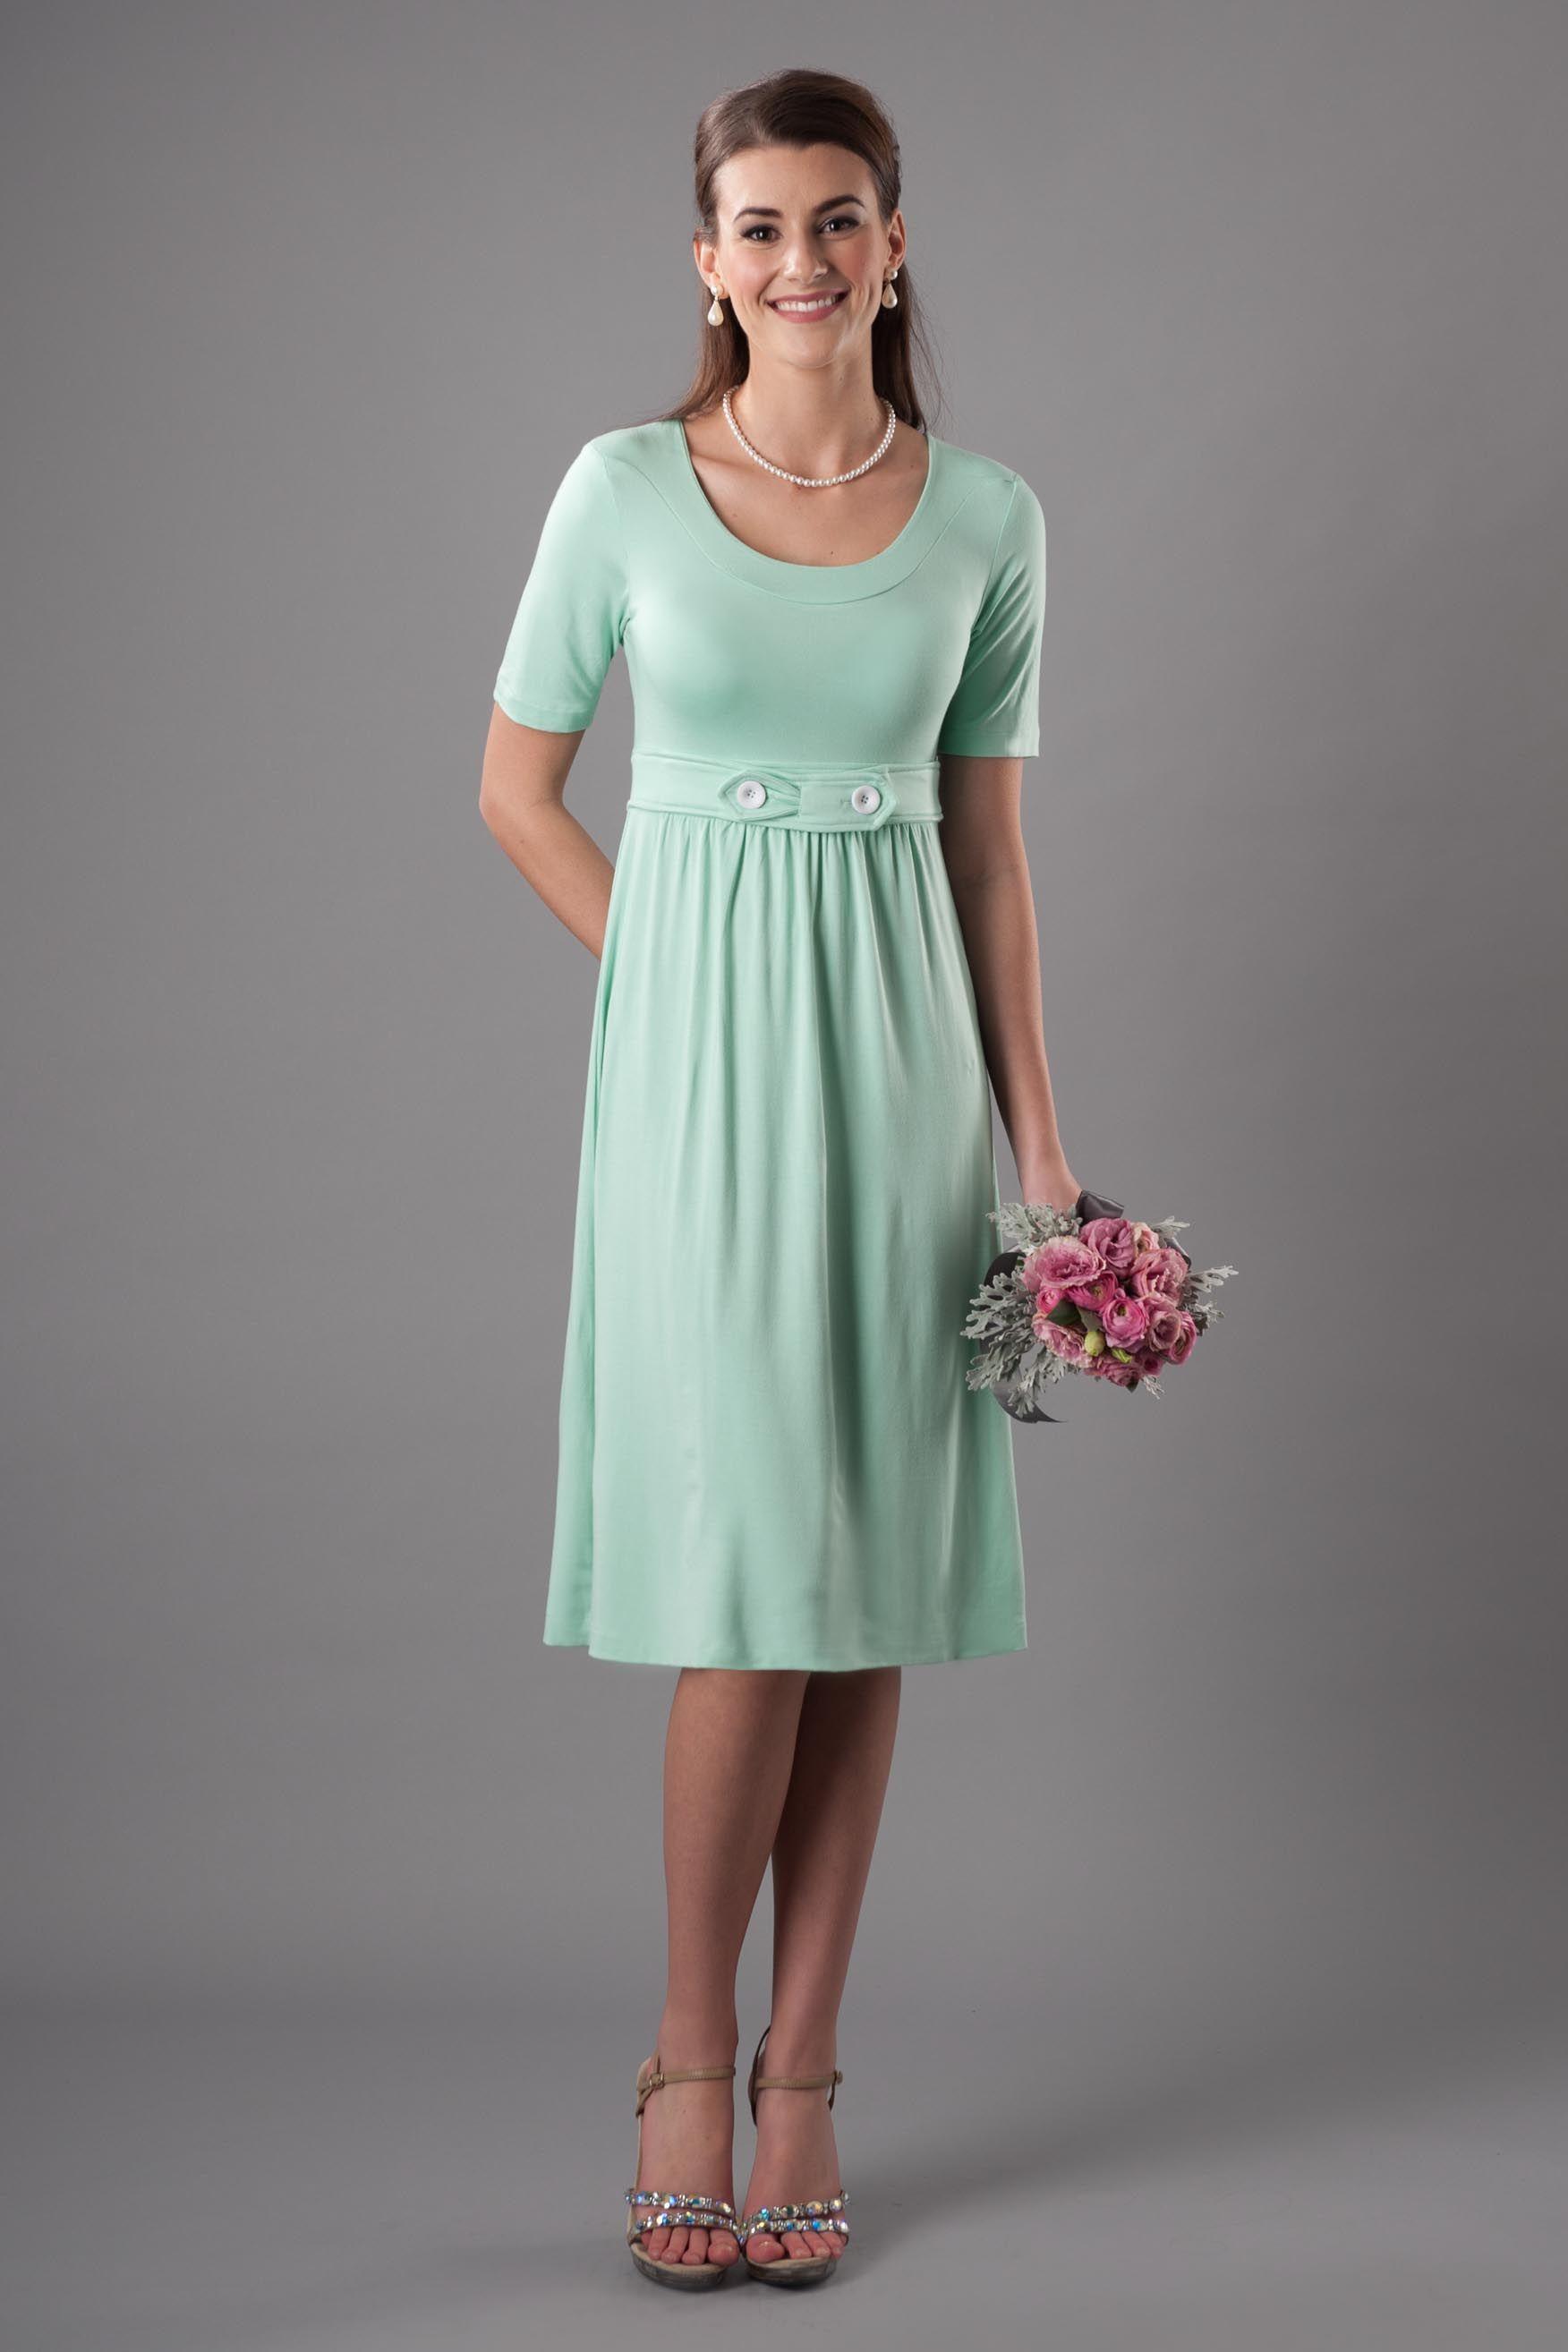 Cheap modest wedding dresses  Modest Bridesmaid Dresses  MR   Vestidos  Pinterest  Modest